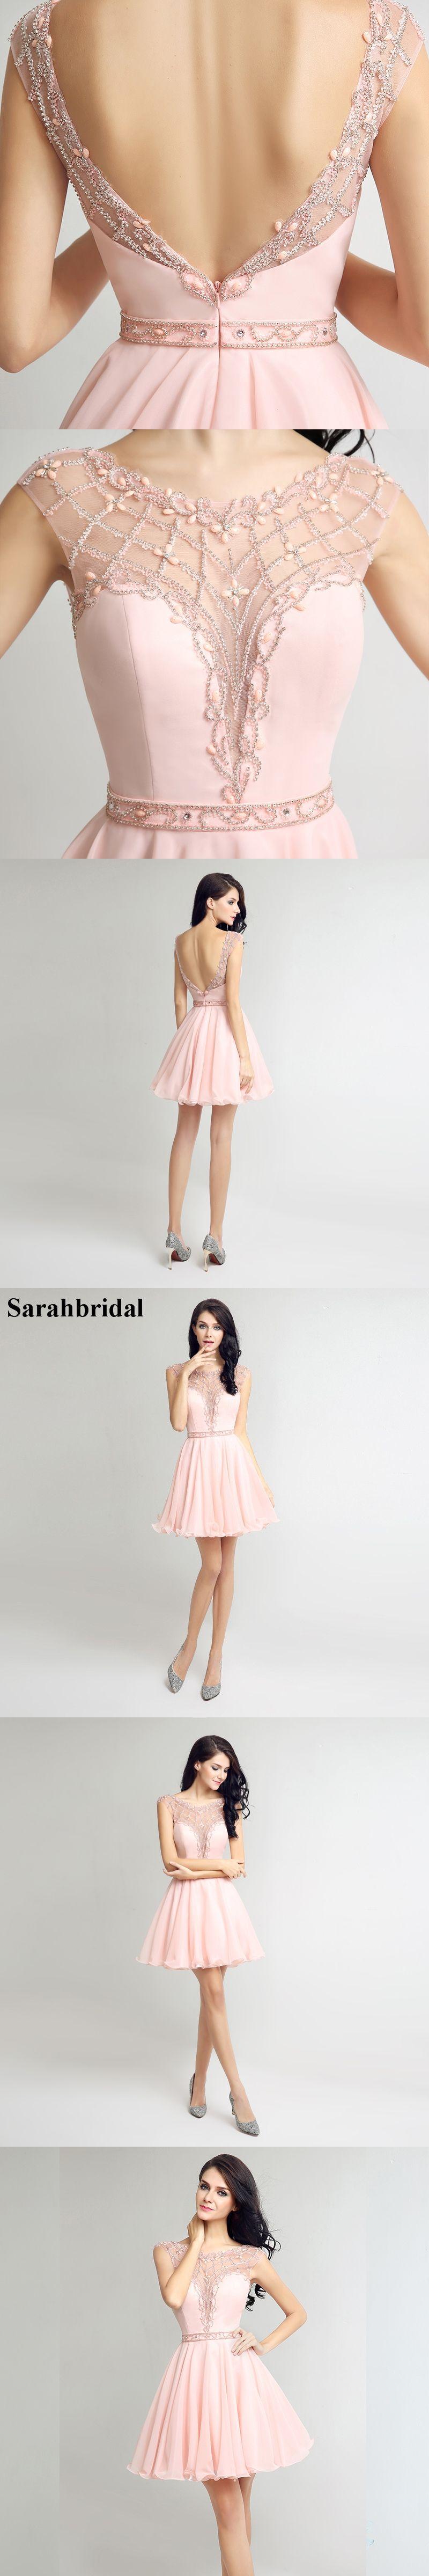 Sweety homecoming short dresses with jewel zipper chiffon